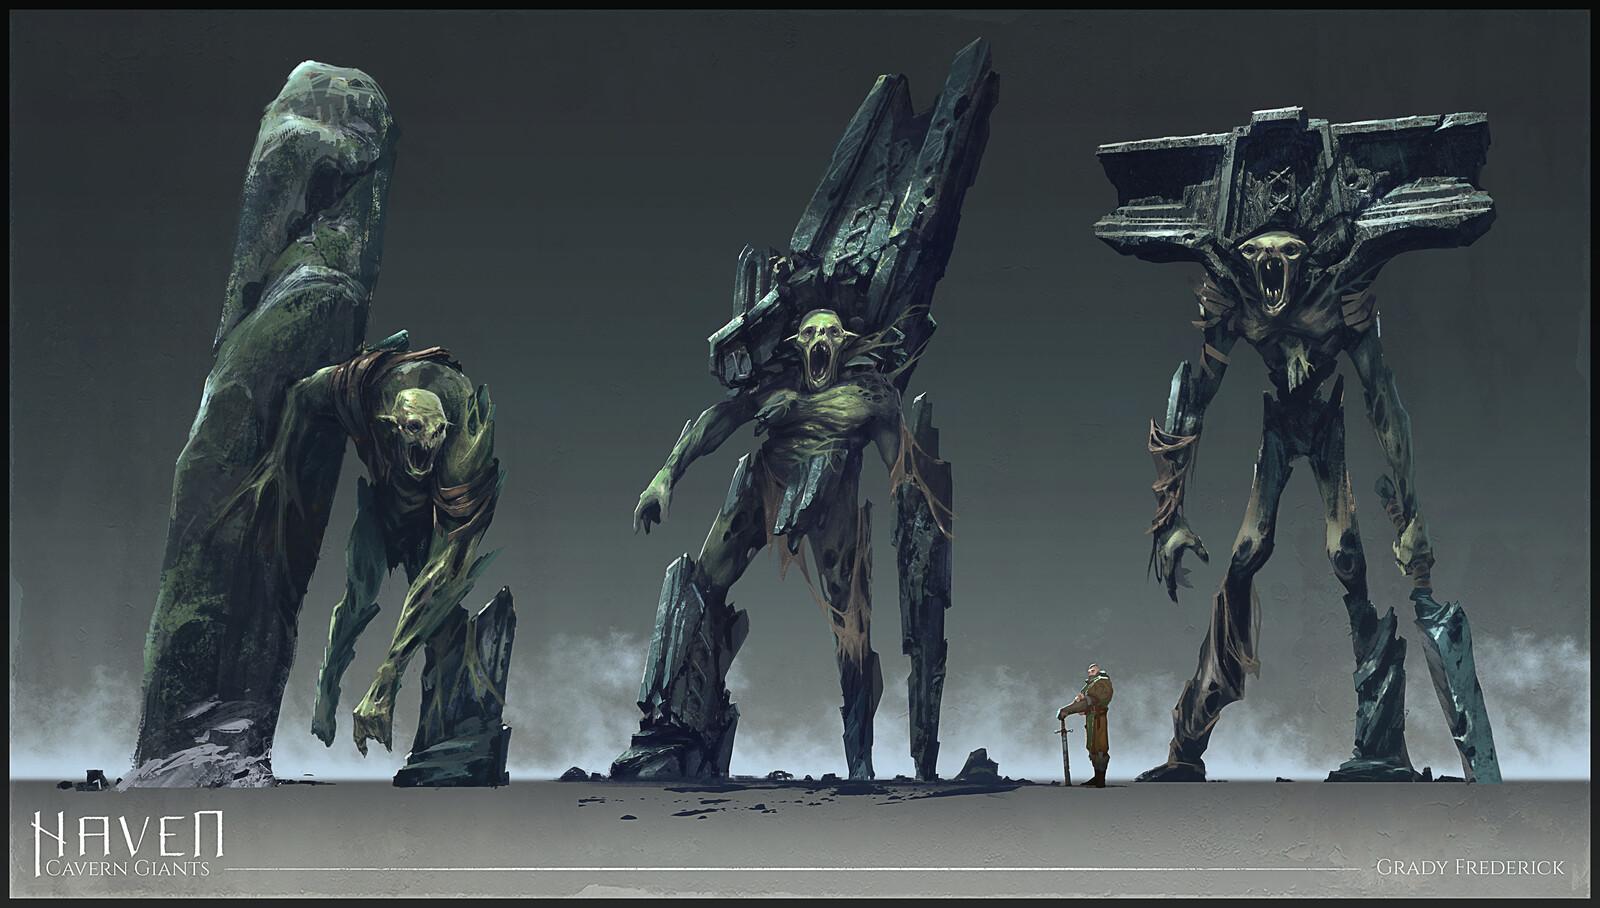 Haven - Cavern Giants